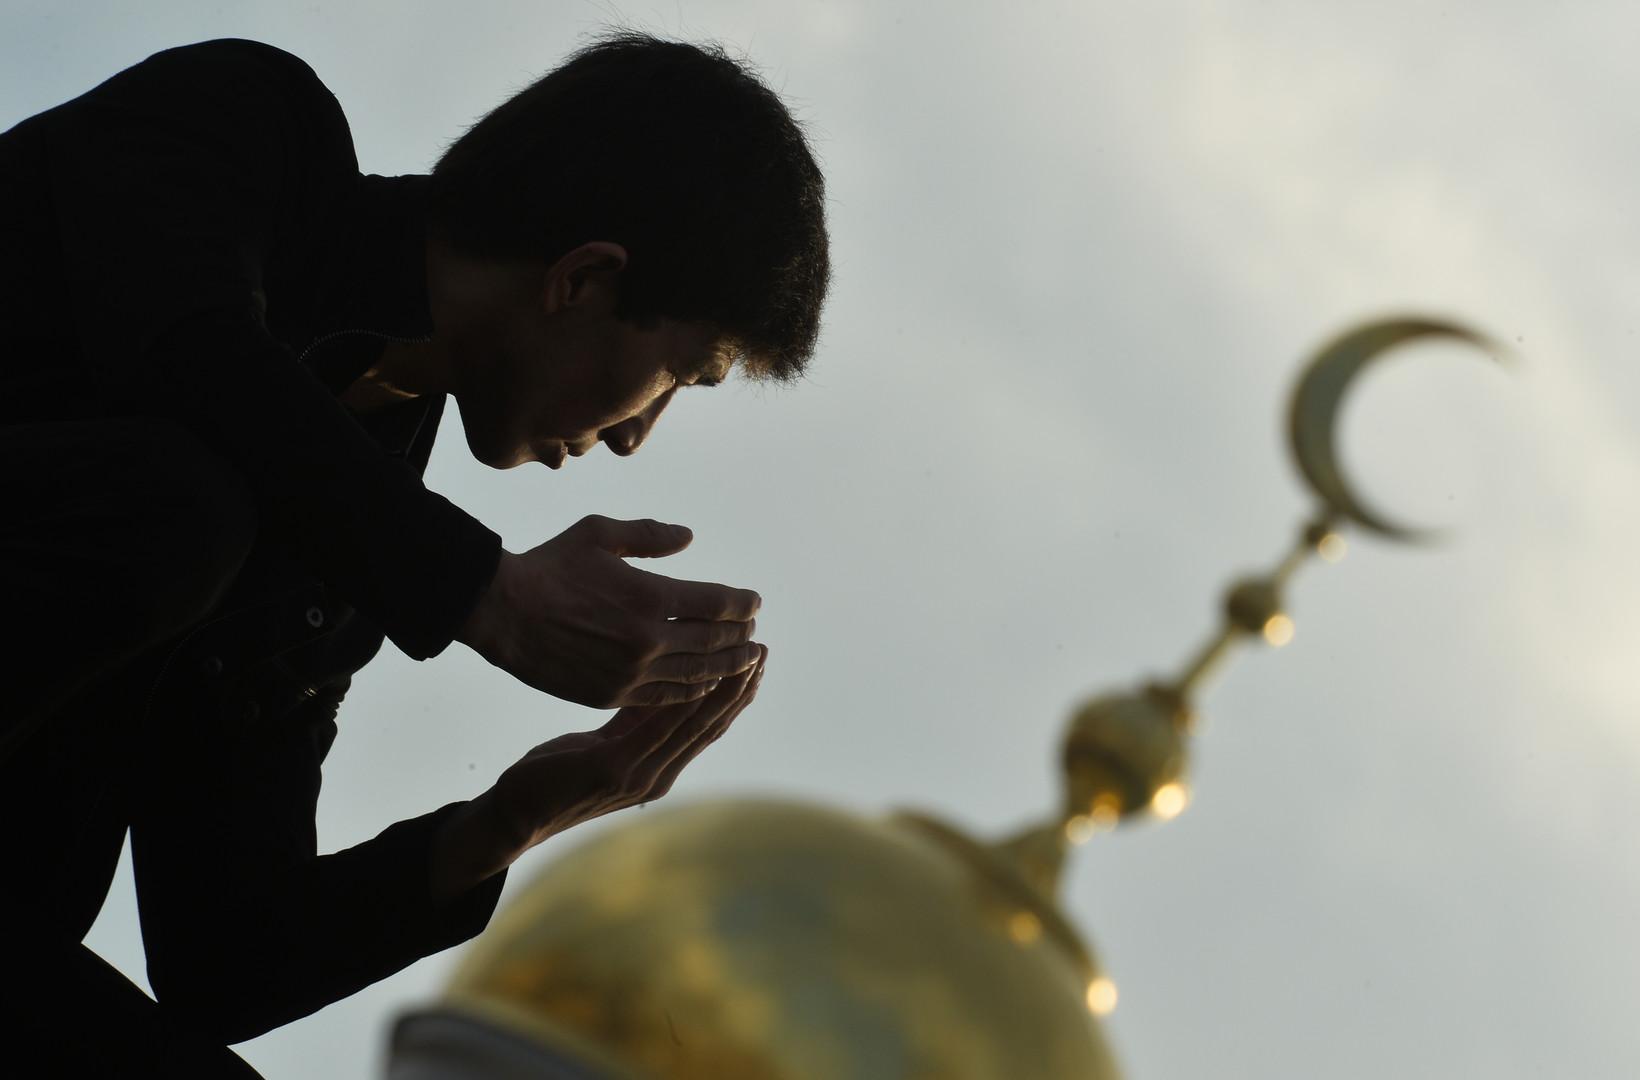 Un jeune musulman devant la grande mosquée de Moscou